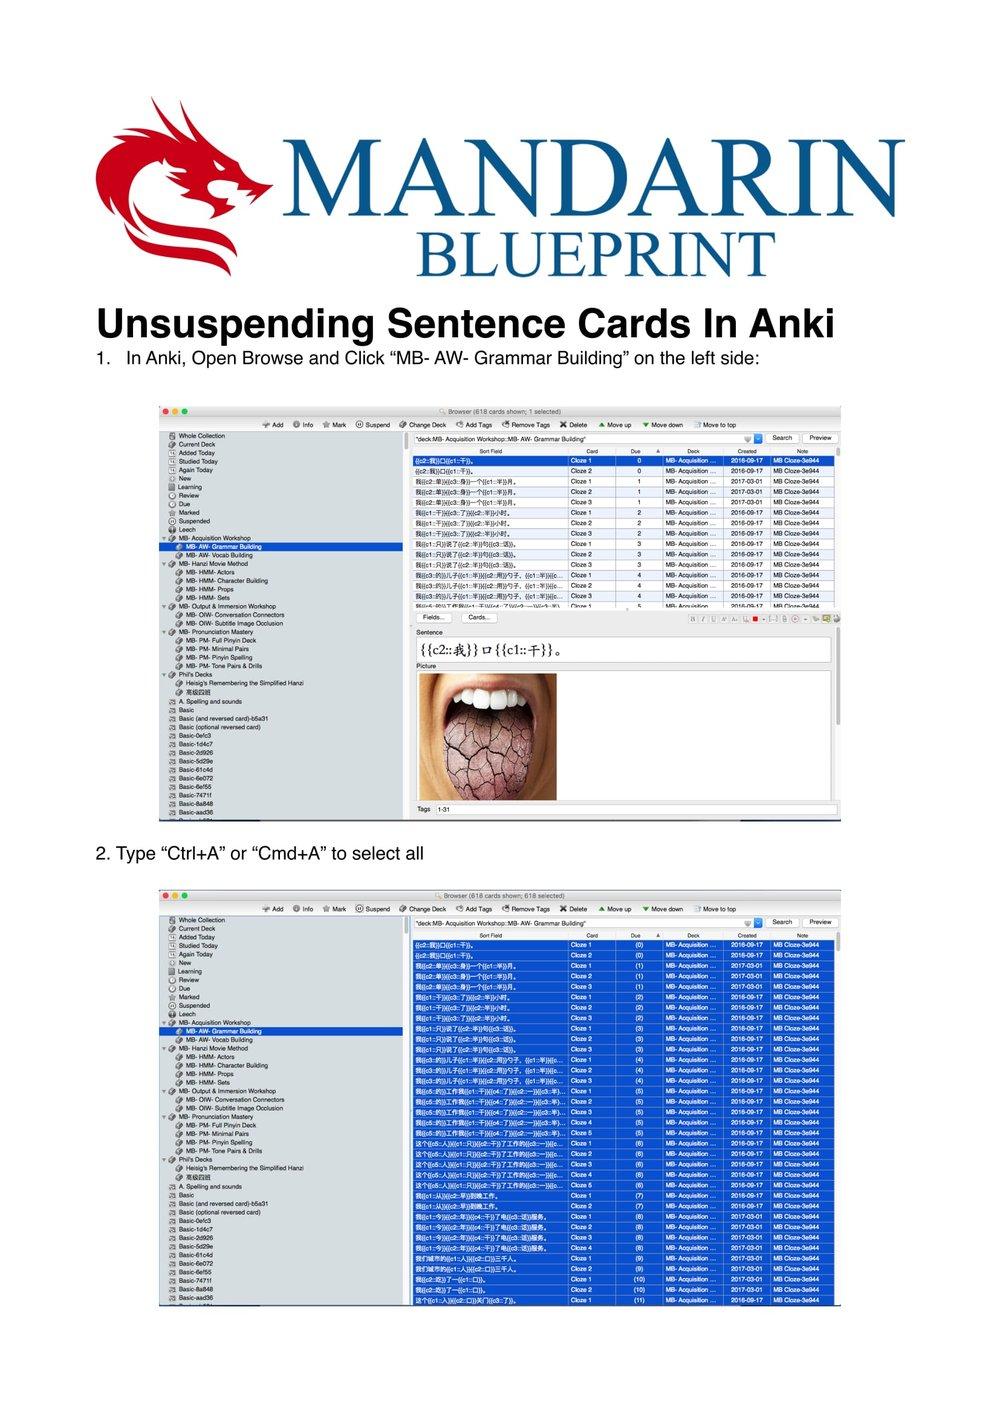 Unsuspending Sentence Cards In Anki-1.jpg